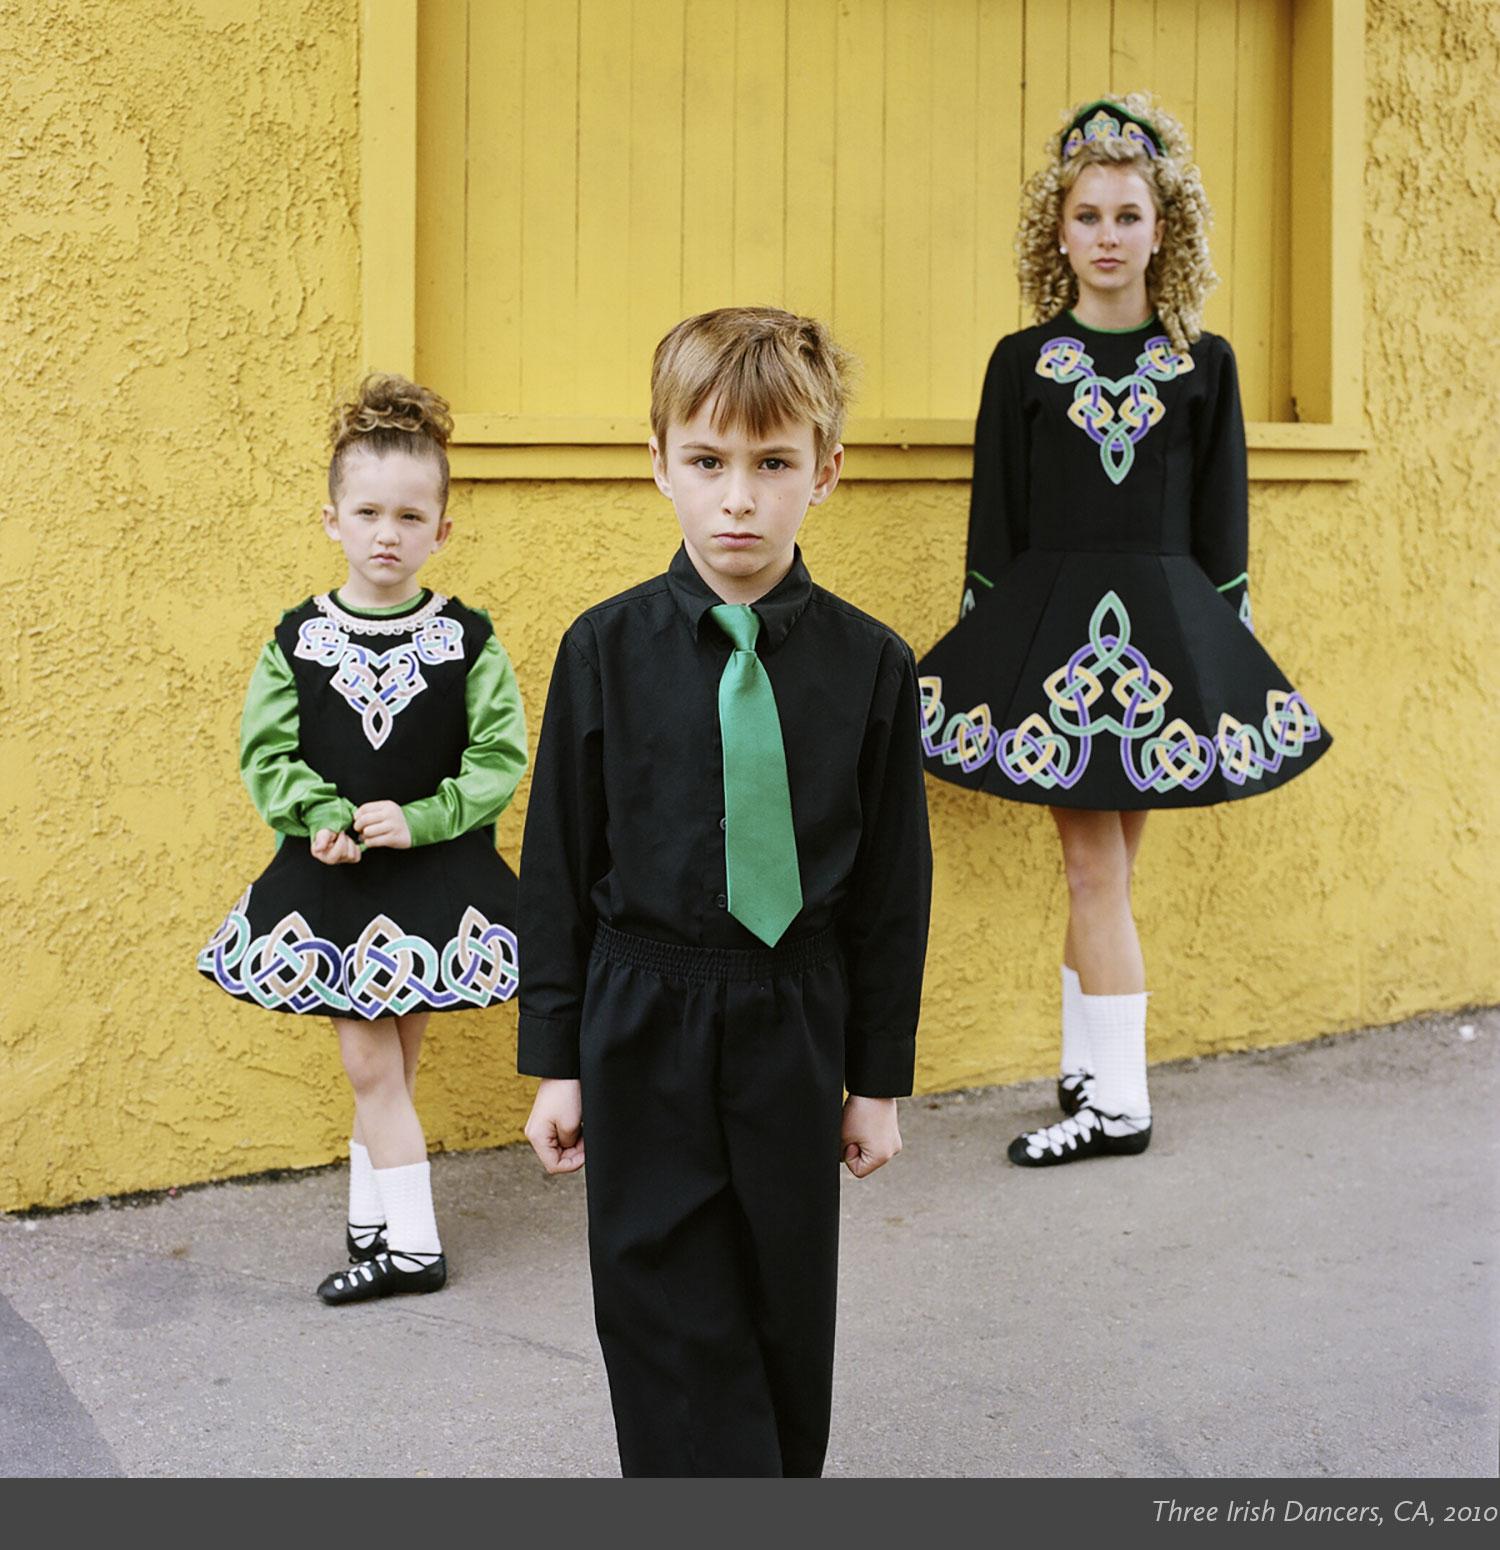 17_Three-Irish-Dancers,-CA,-2010.jpg